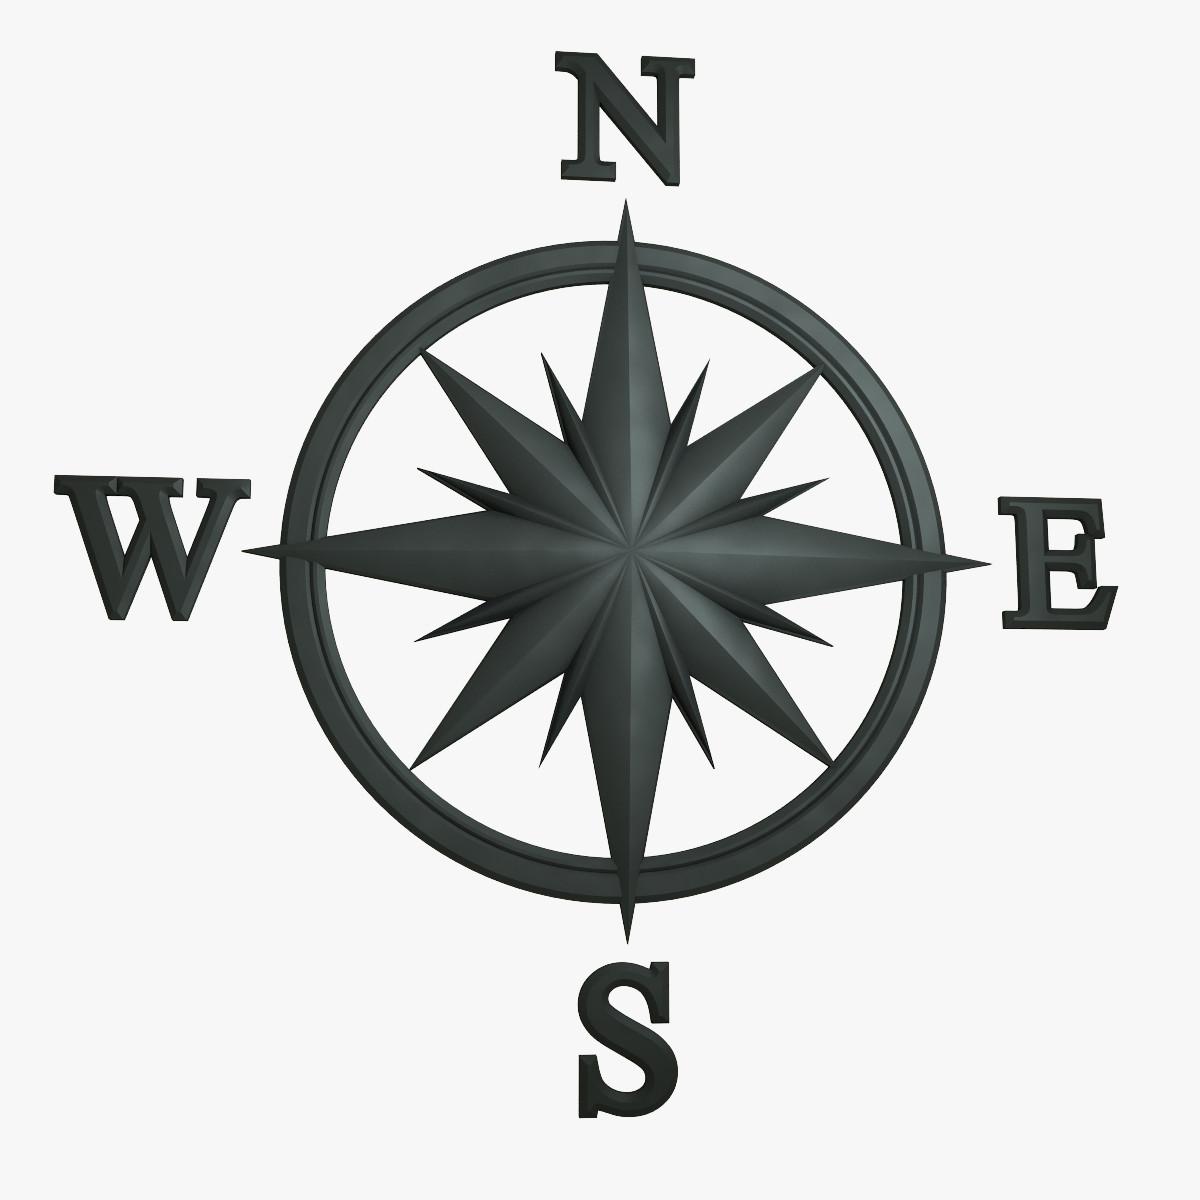 compass-image01.jpg